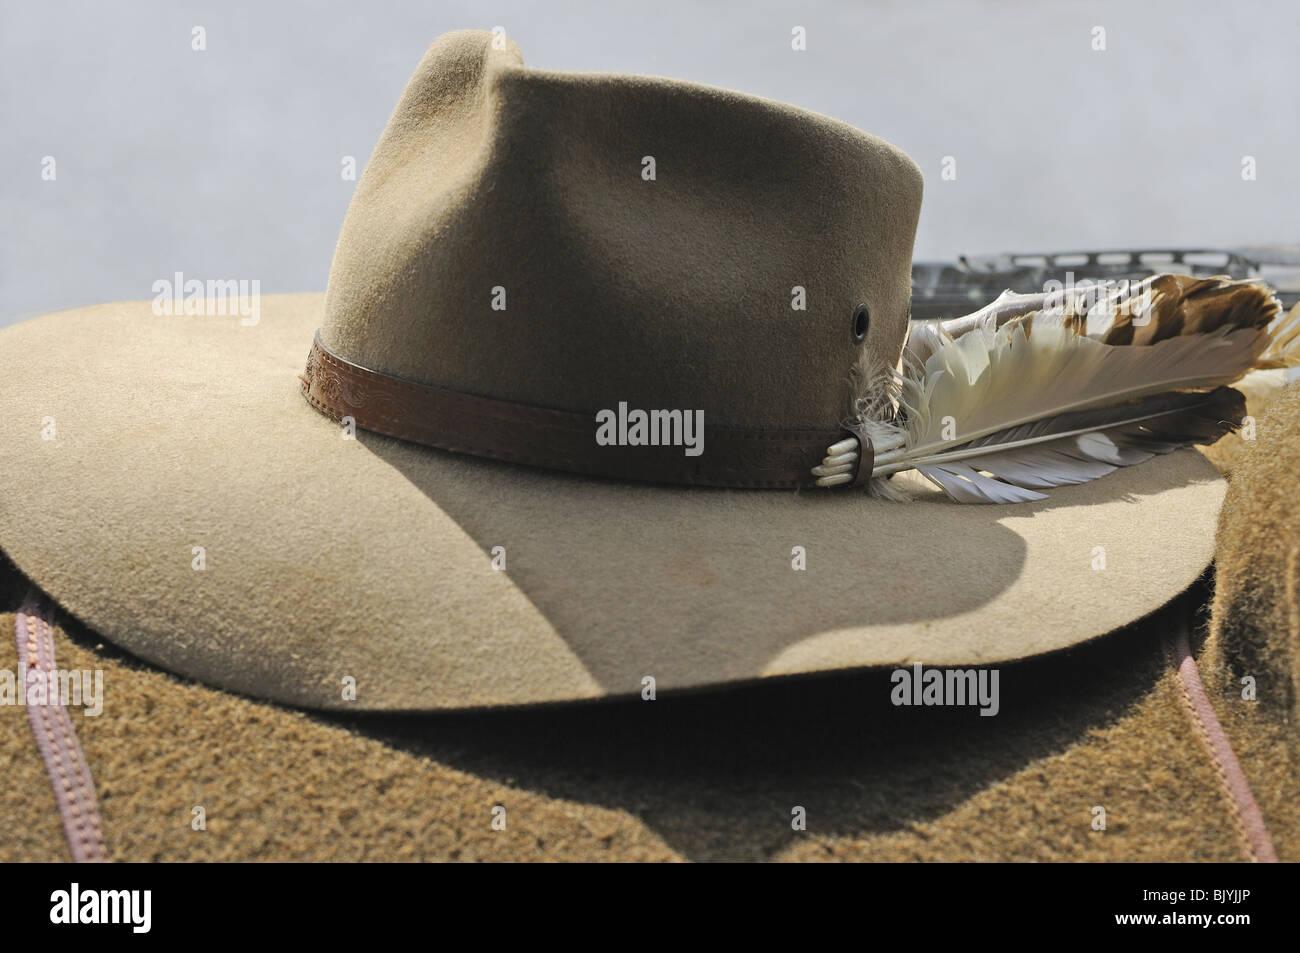 "Australian cowboy 's hat "" Episteme ' nel parco nazionale Kakadu, Territorio del Nord Australia Immagini Stock"